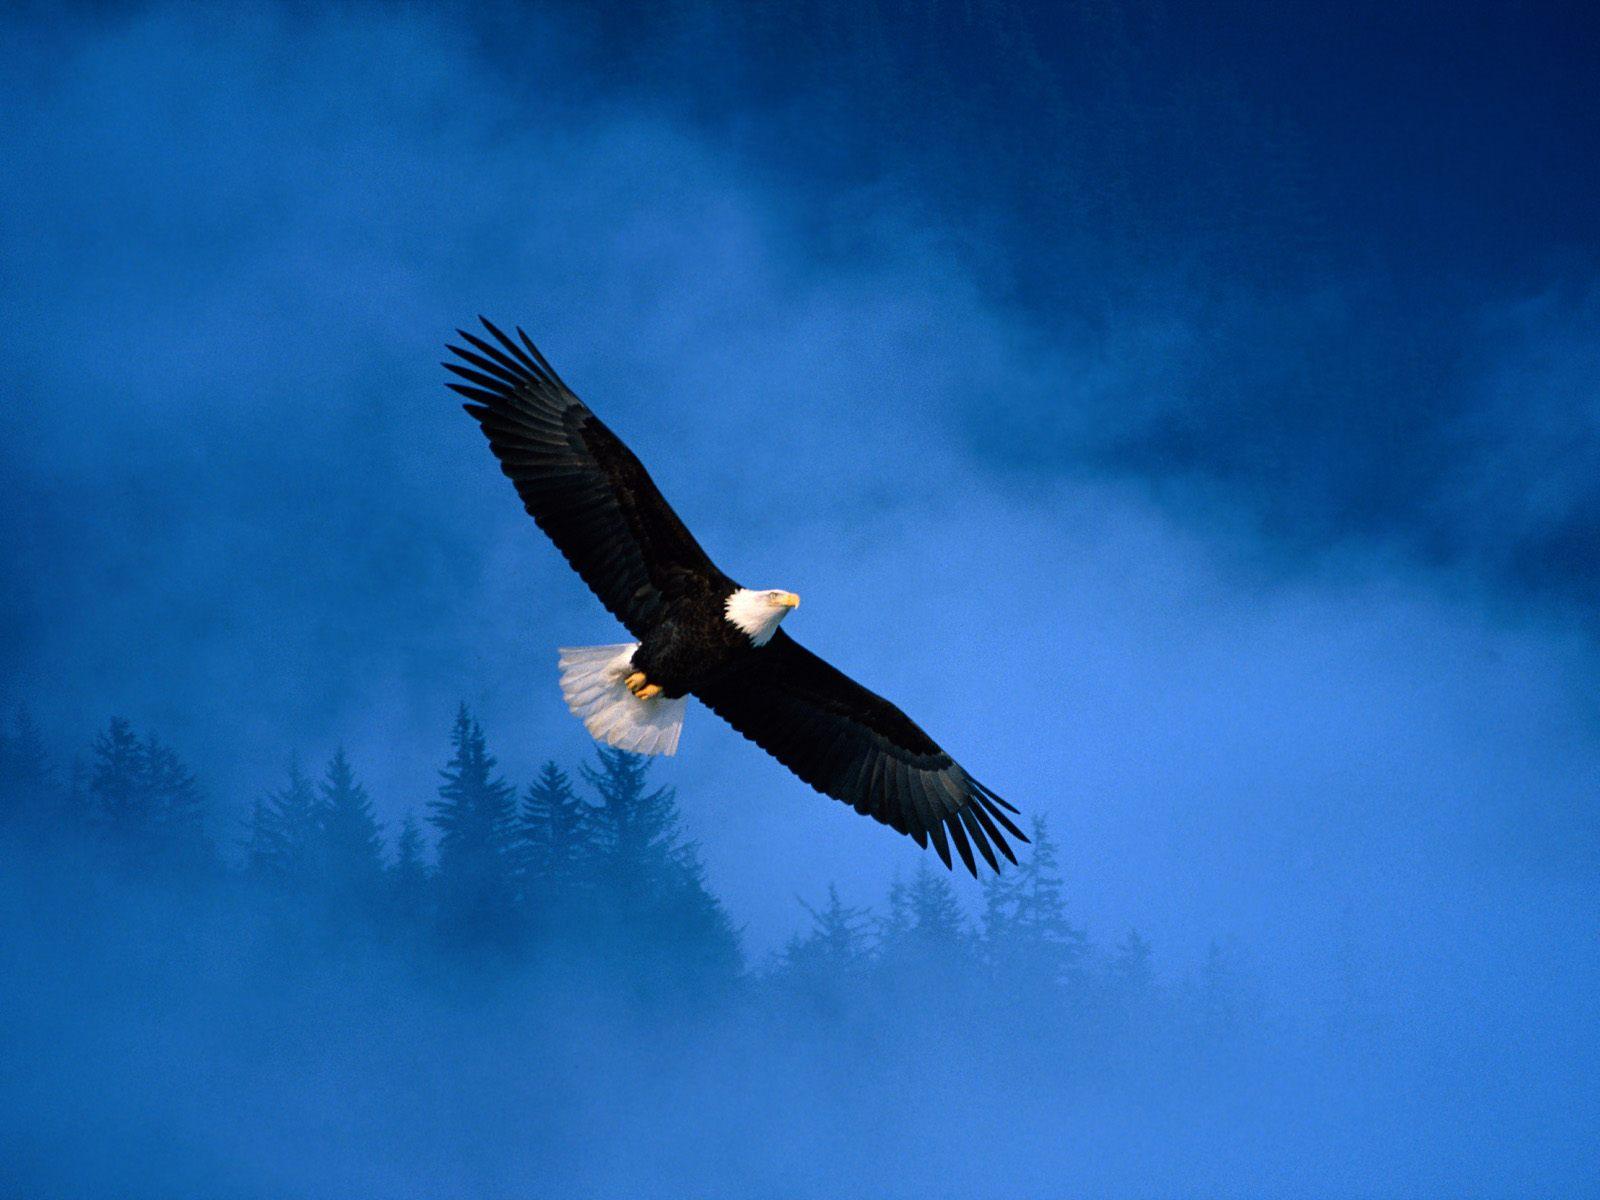 http://1.bp.blogspot.com/_2IU2Nt4rD1k/S7em_bcyhfI/AAAAAAAABUY/7kGia0EKZAM/s1600/Eagle-Pictures-90.jpg